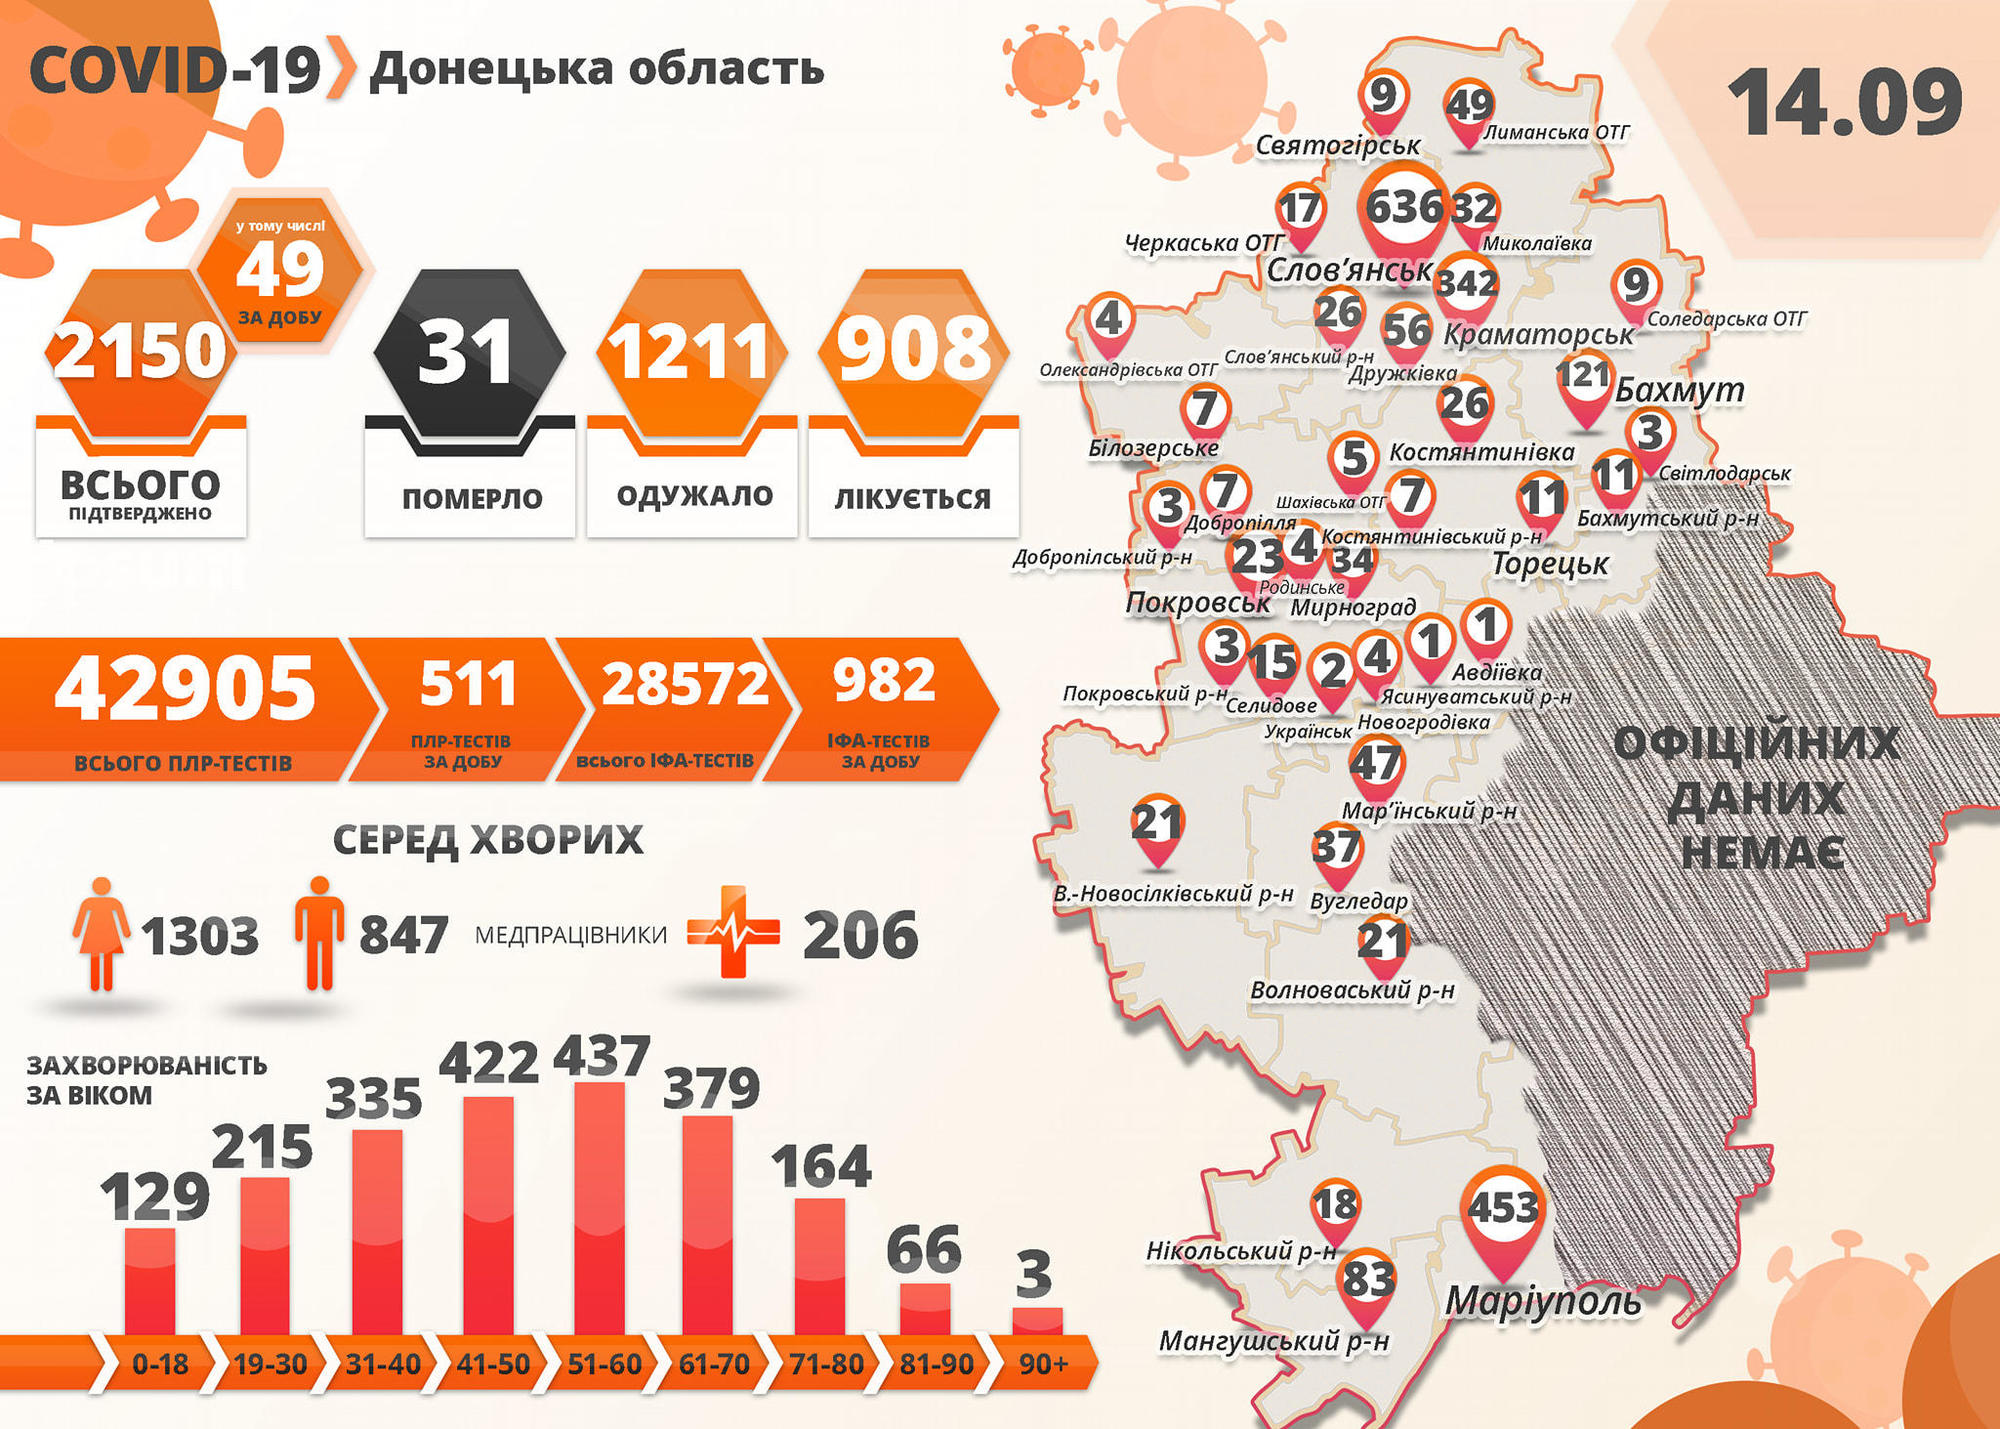 инфографика ДонОГА коронавирус статистика